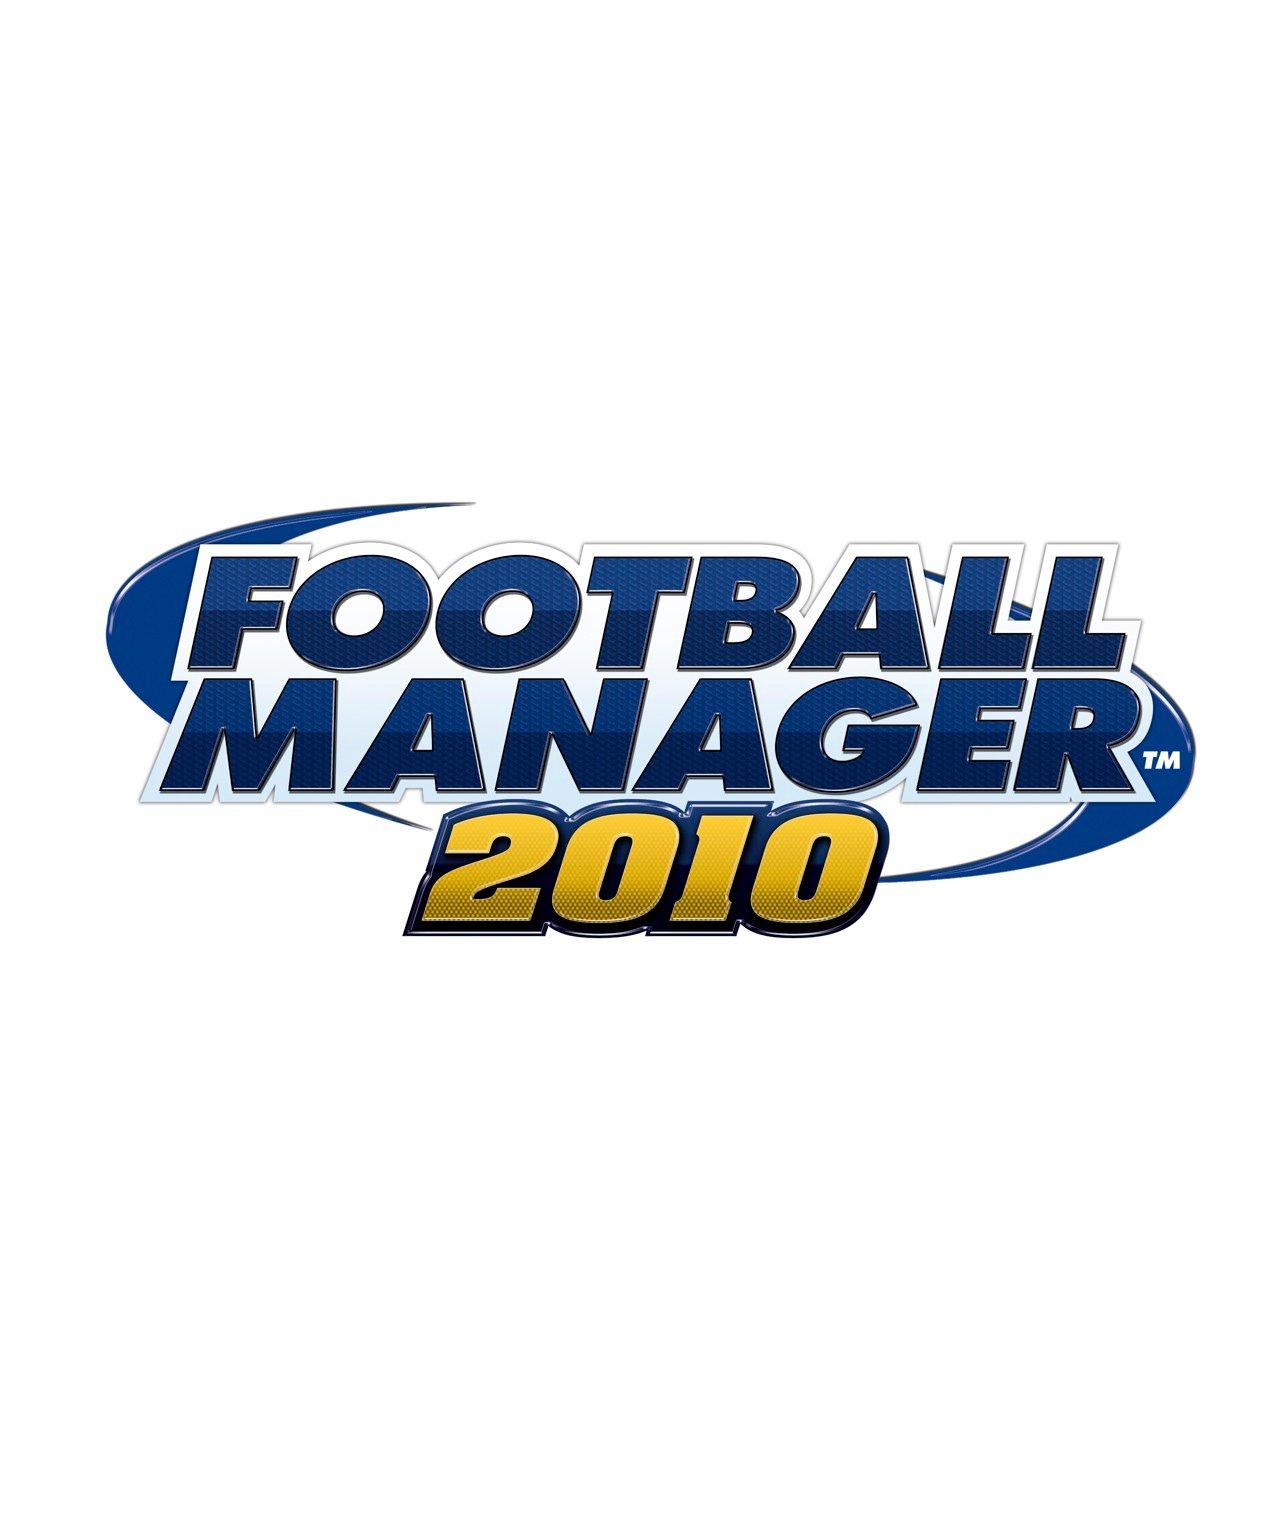 FootballManager2010 PC Div001